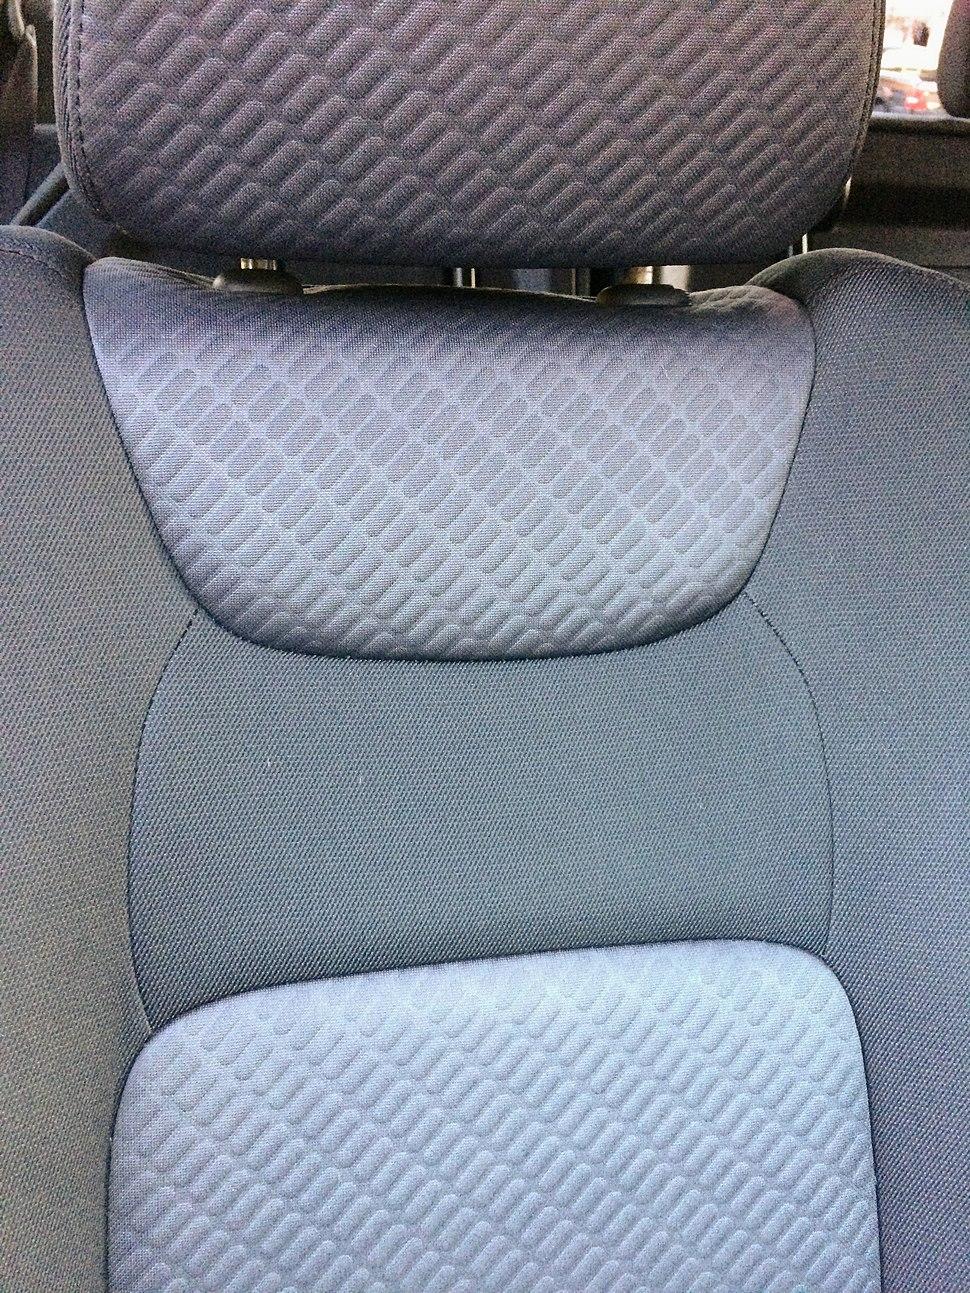 Honda Ridgeline Howling Pixel 20062007 Electrical Troubleshooting Manual Original 2006 Rts Two Tone Cloth Seat